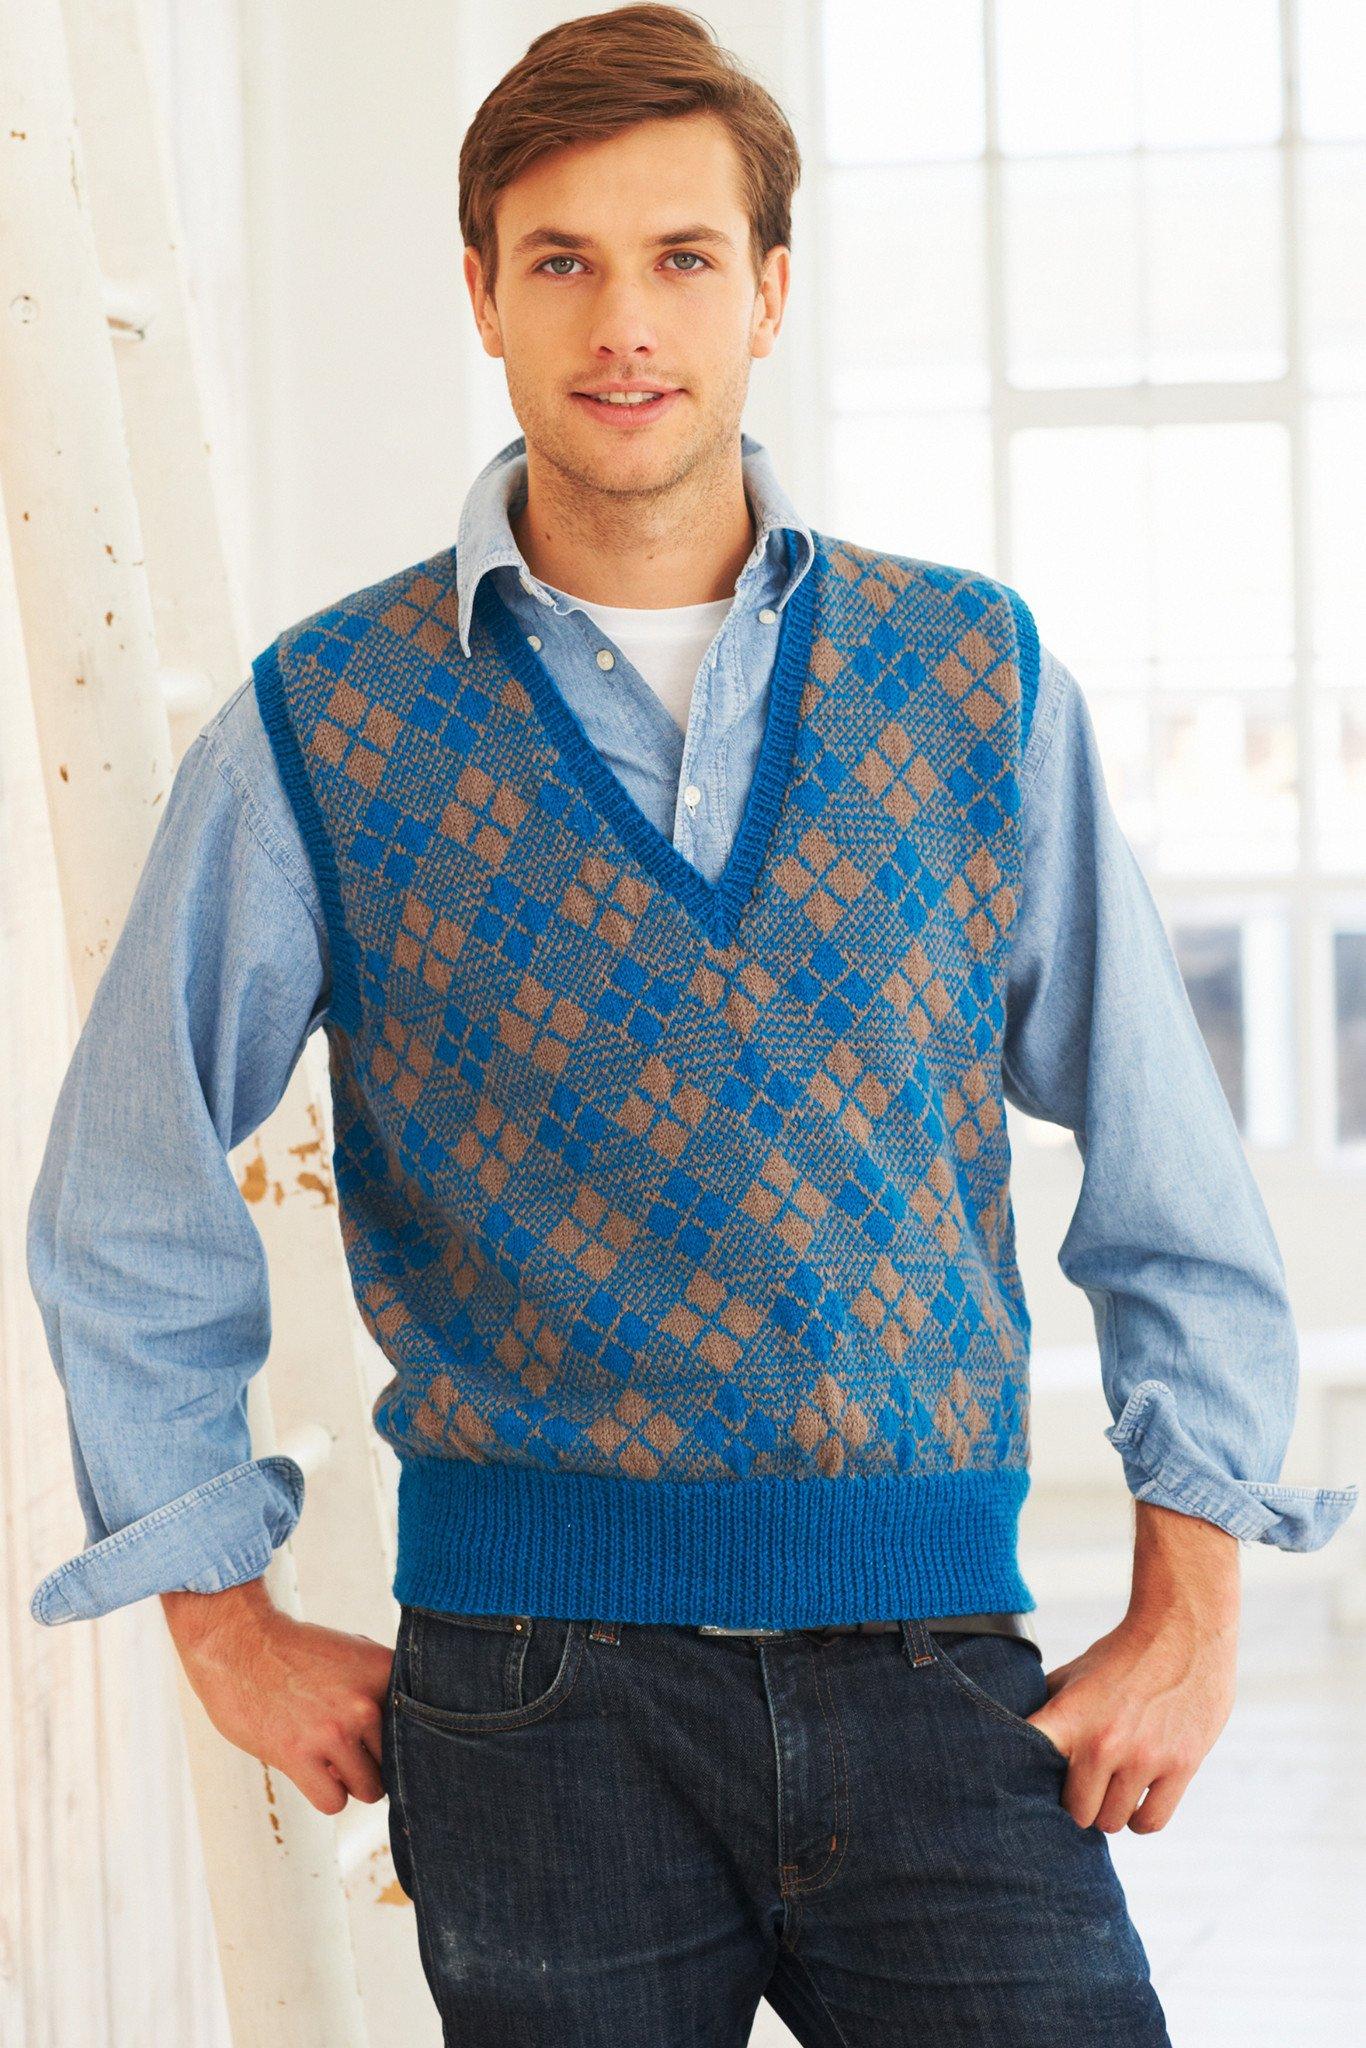 Joie Fair Isle Sweater | Fair Isle Knitting | Fair Isle Sweater